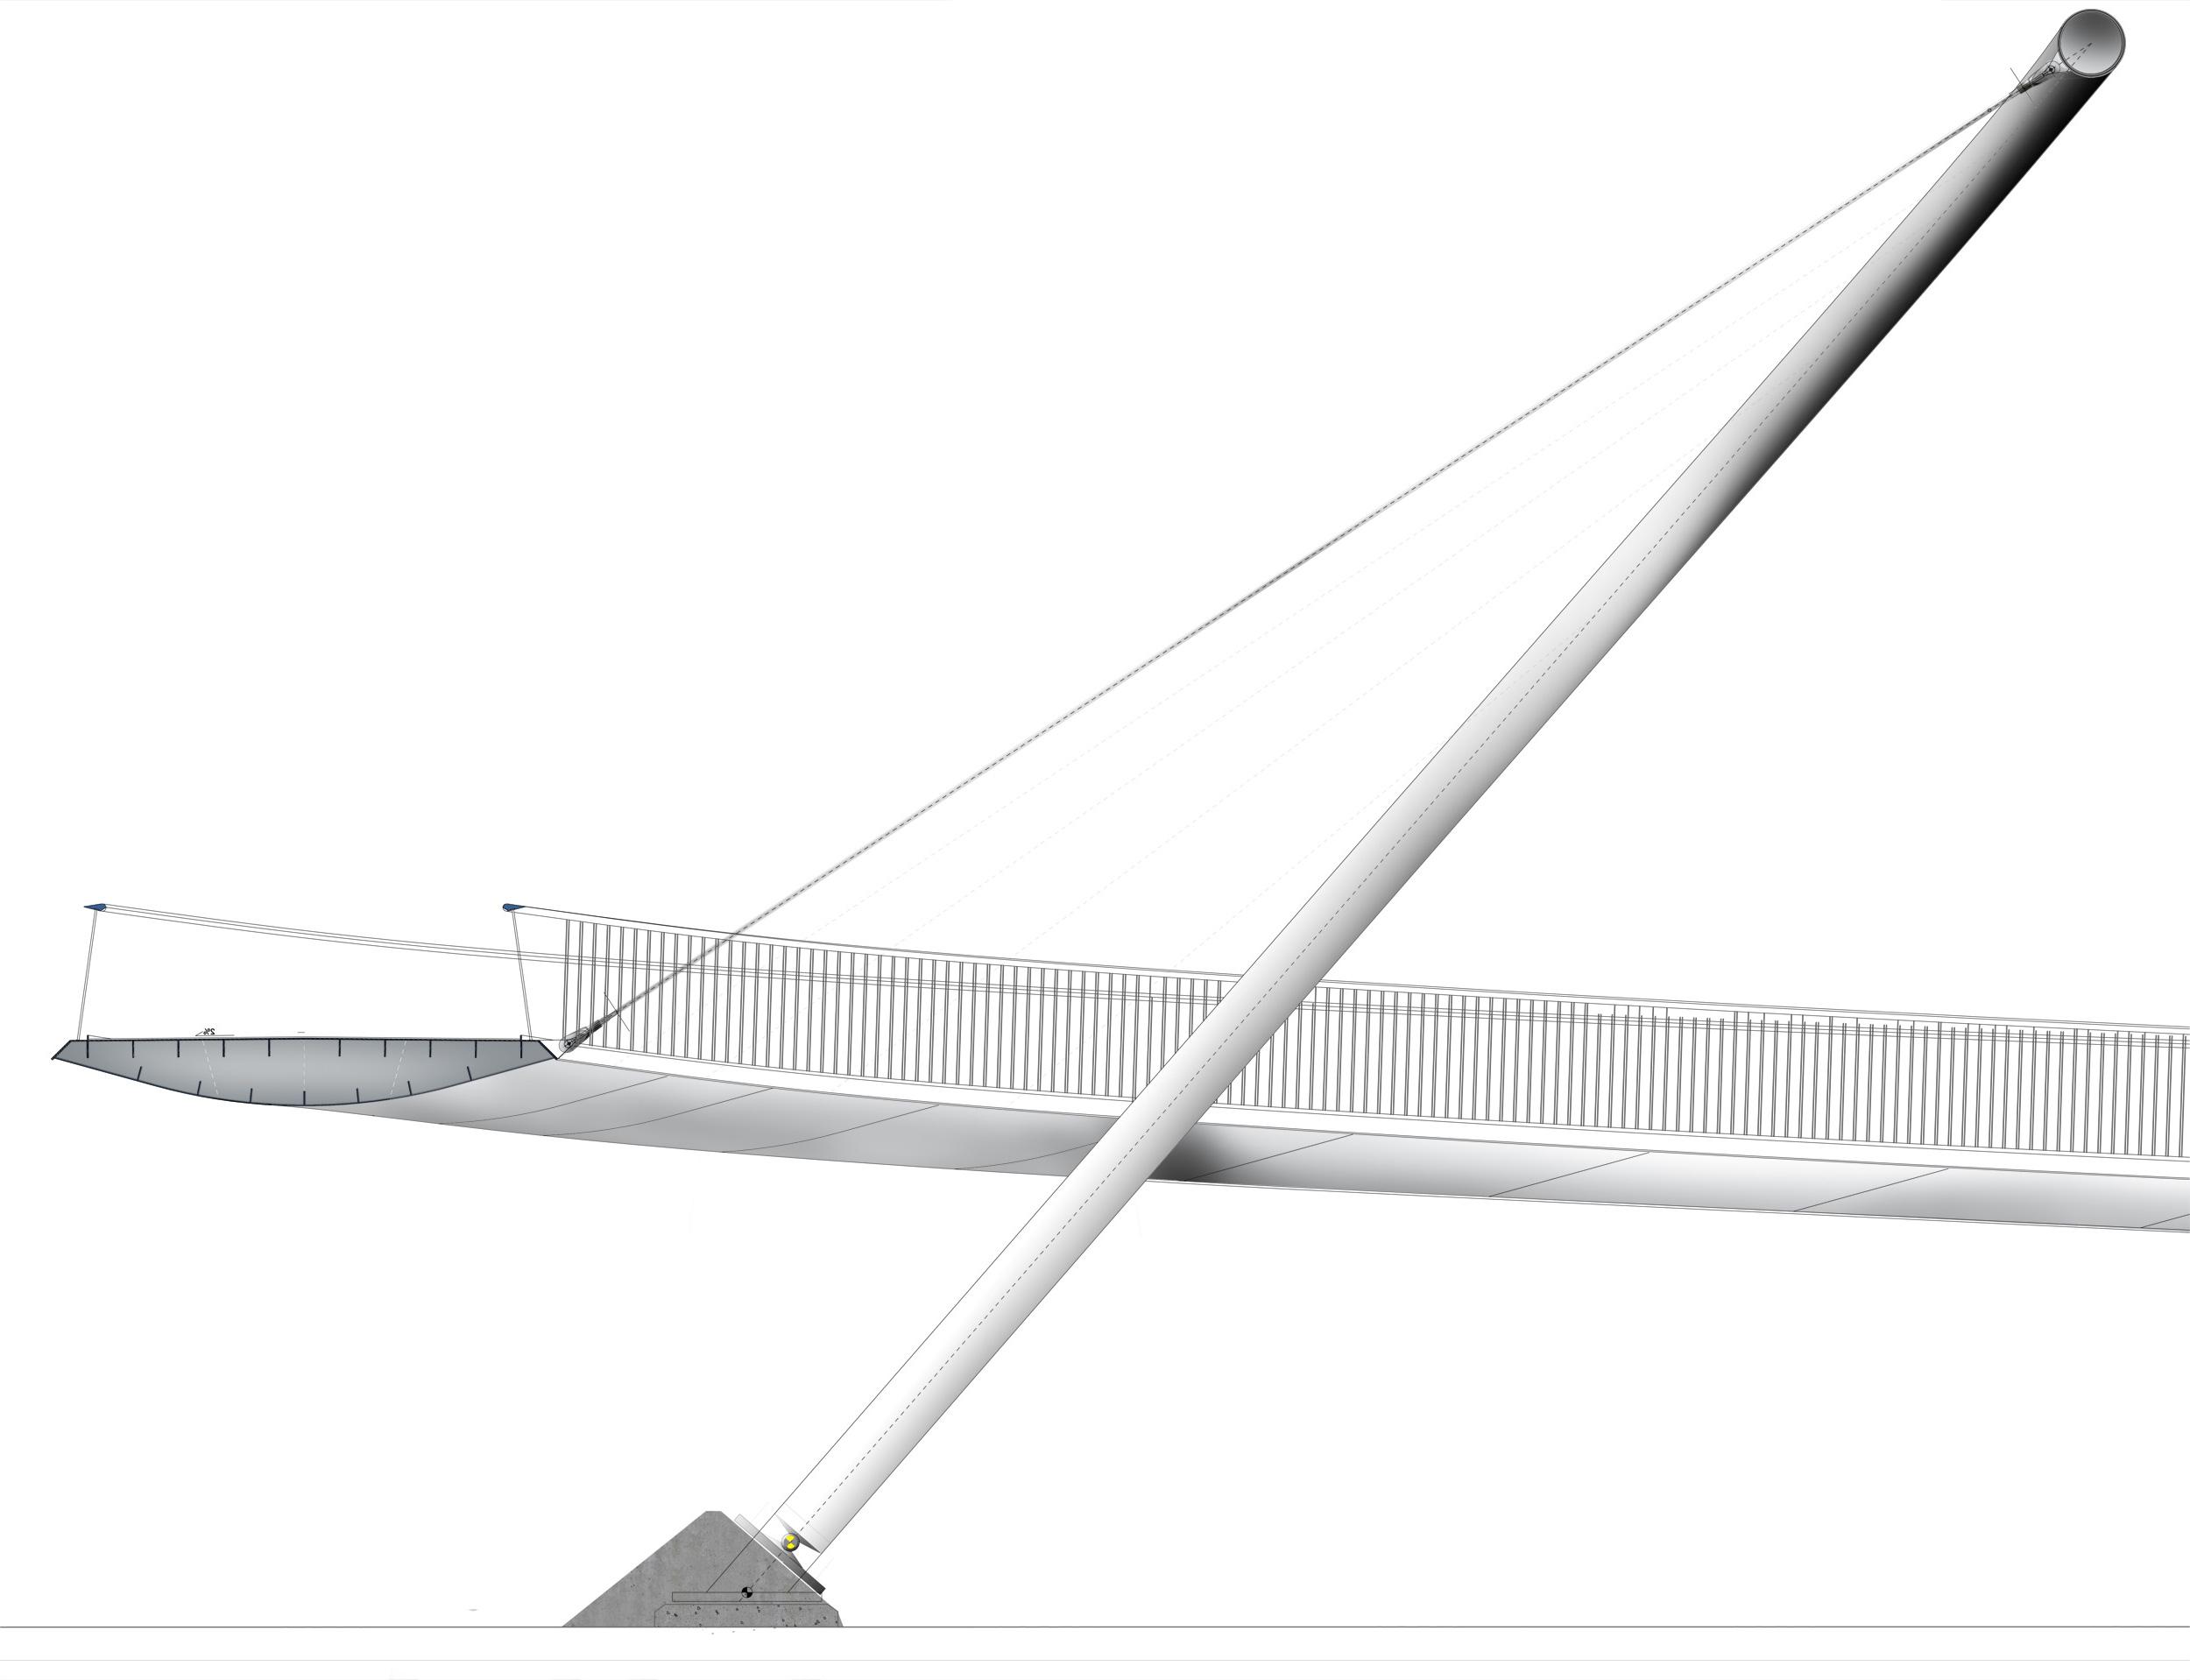 20120410-Cross-section-bridge-deck-Layout1-(5)-(1).jpg